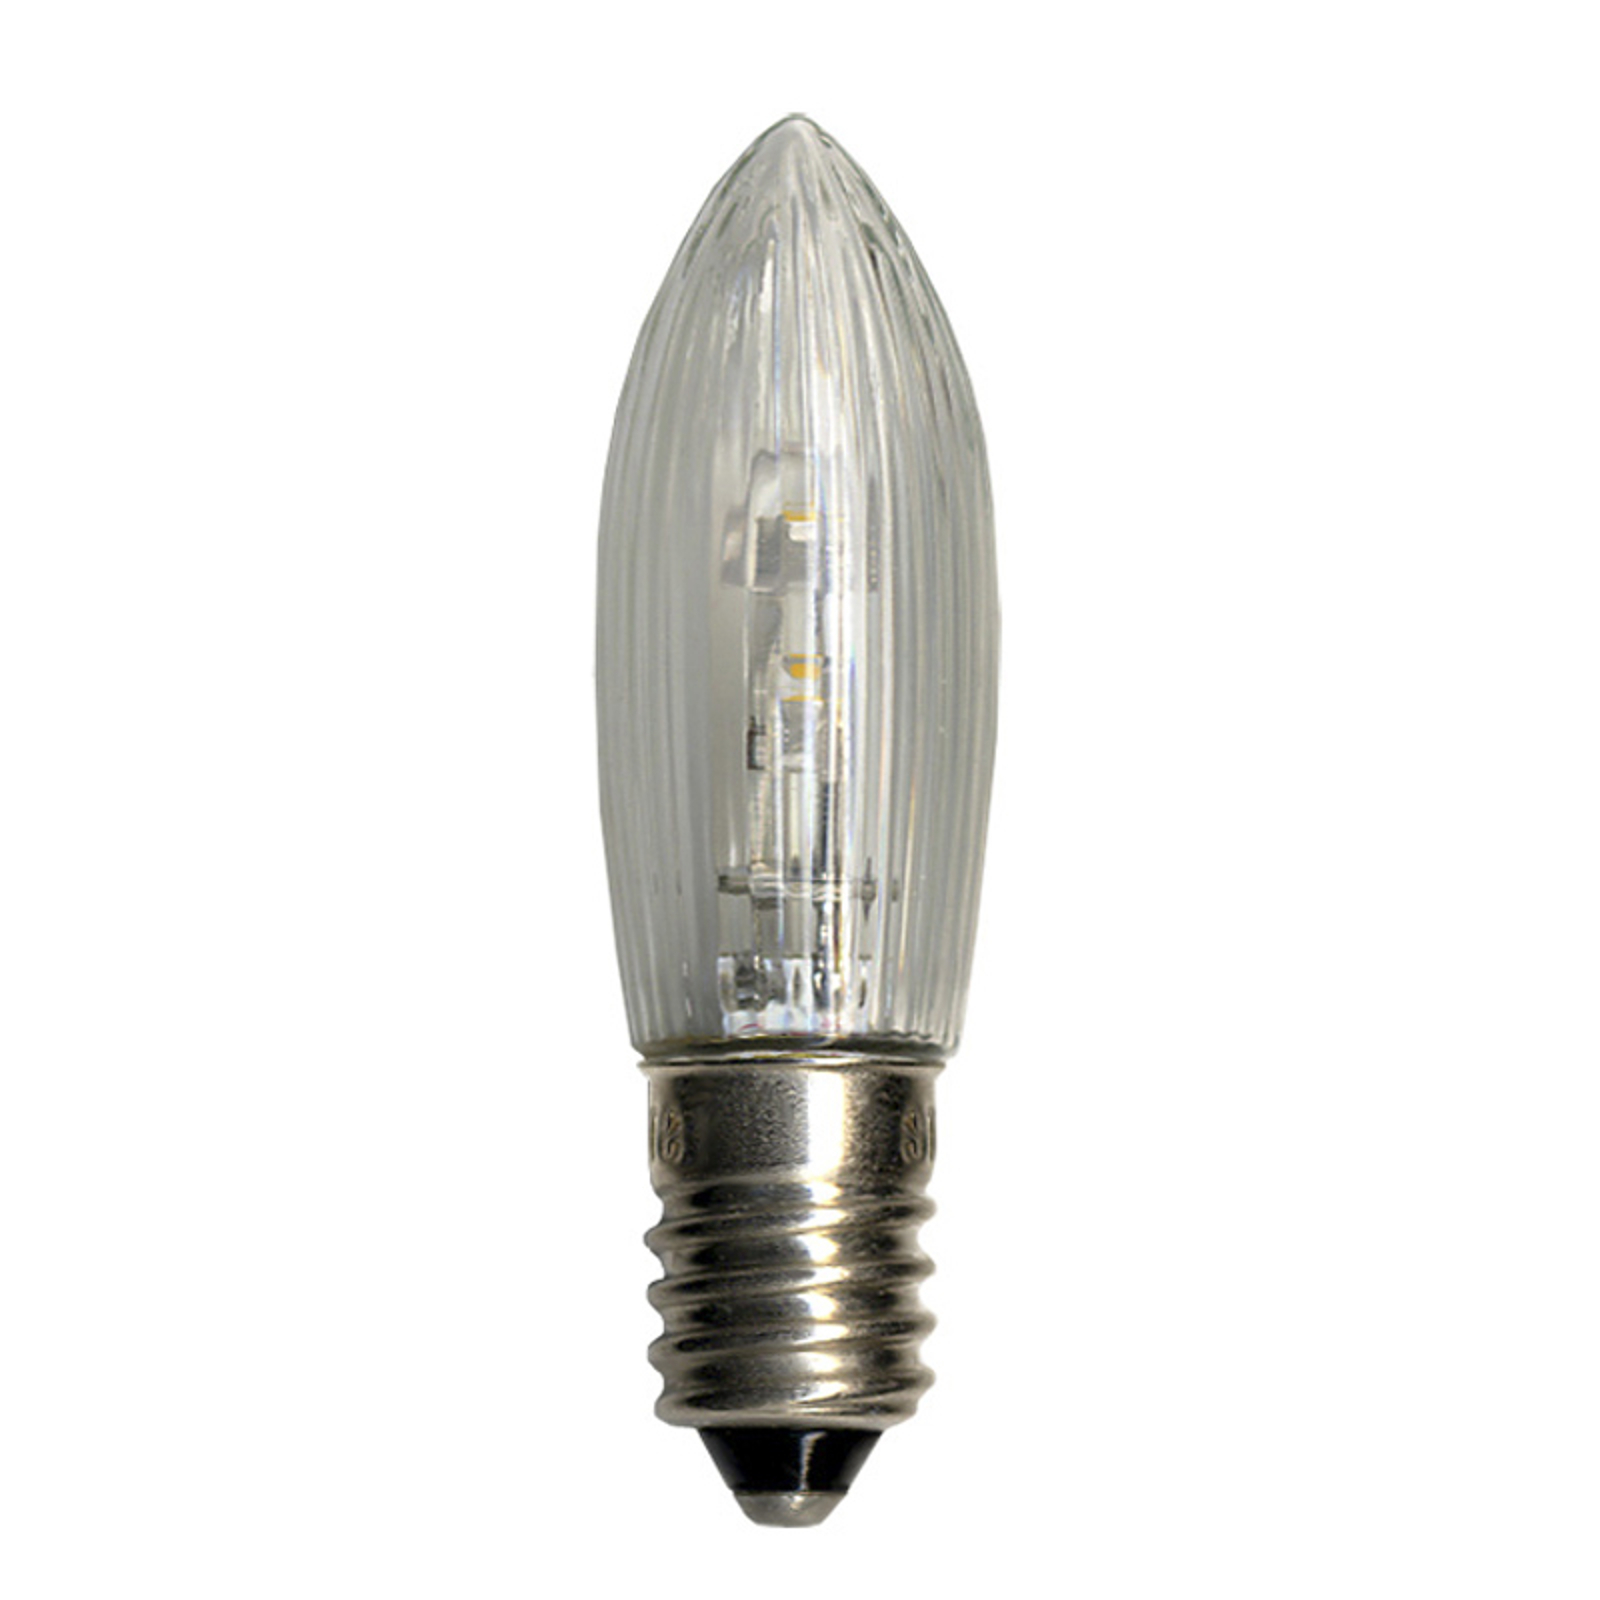 Lampki zapasowe LED E10 0,2W 10-55V 3 szt